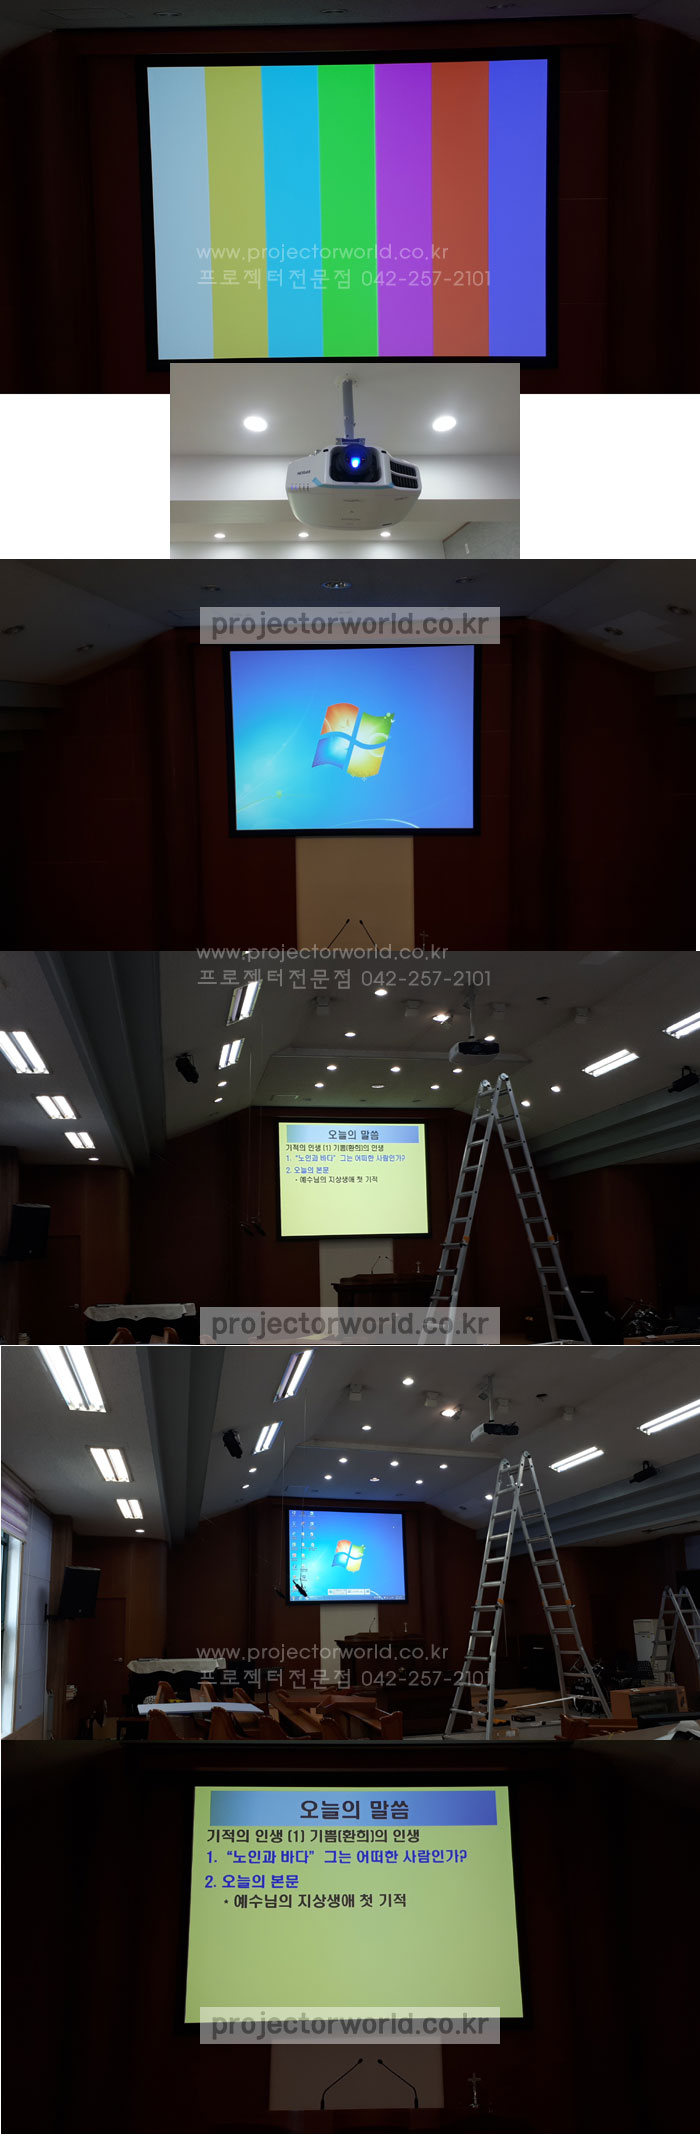 EB-G7100,eb-g7100,